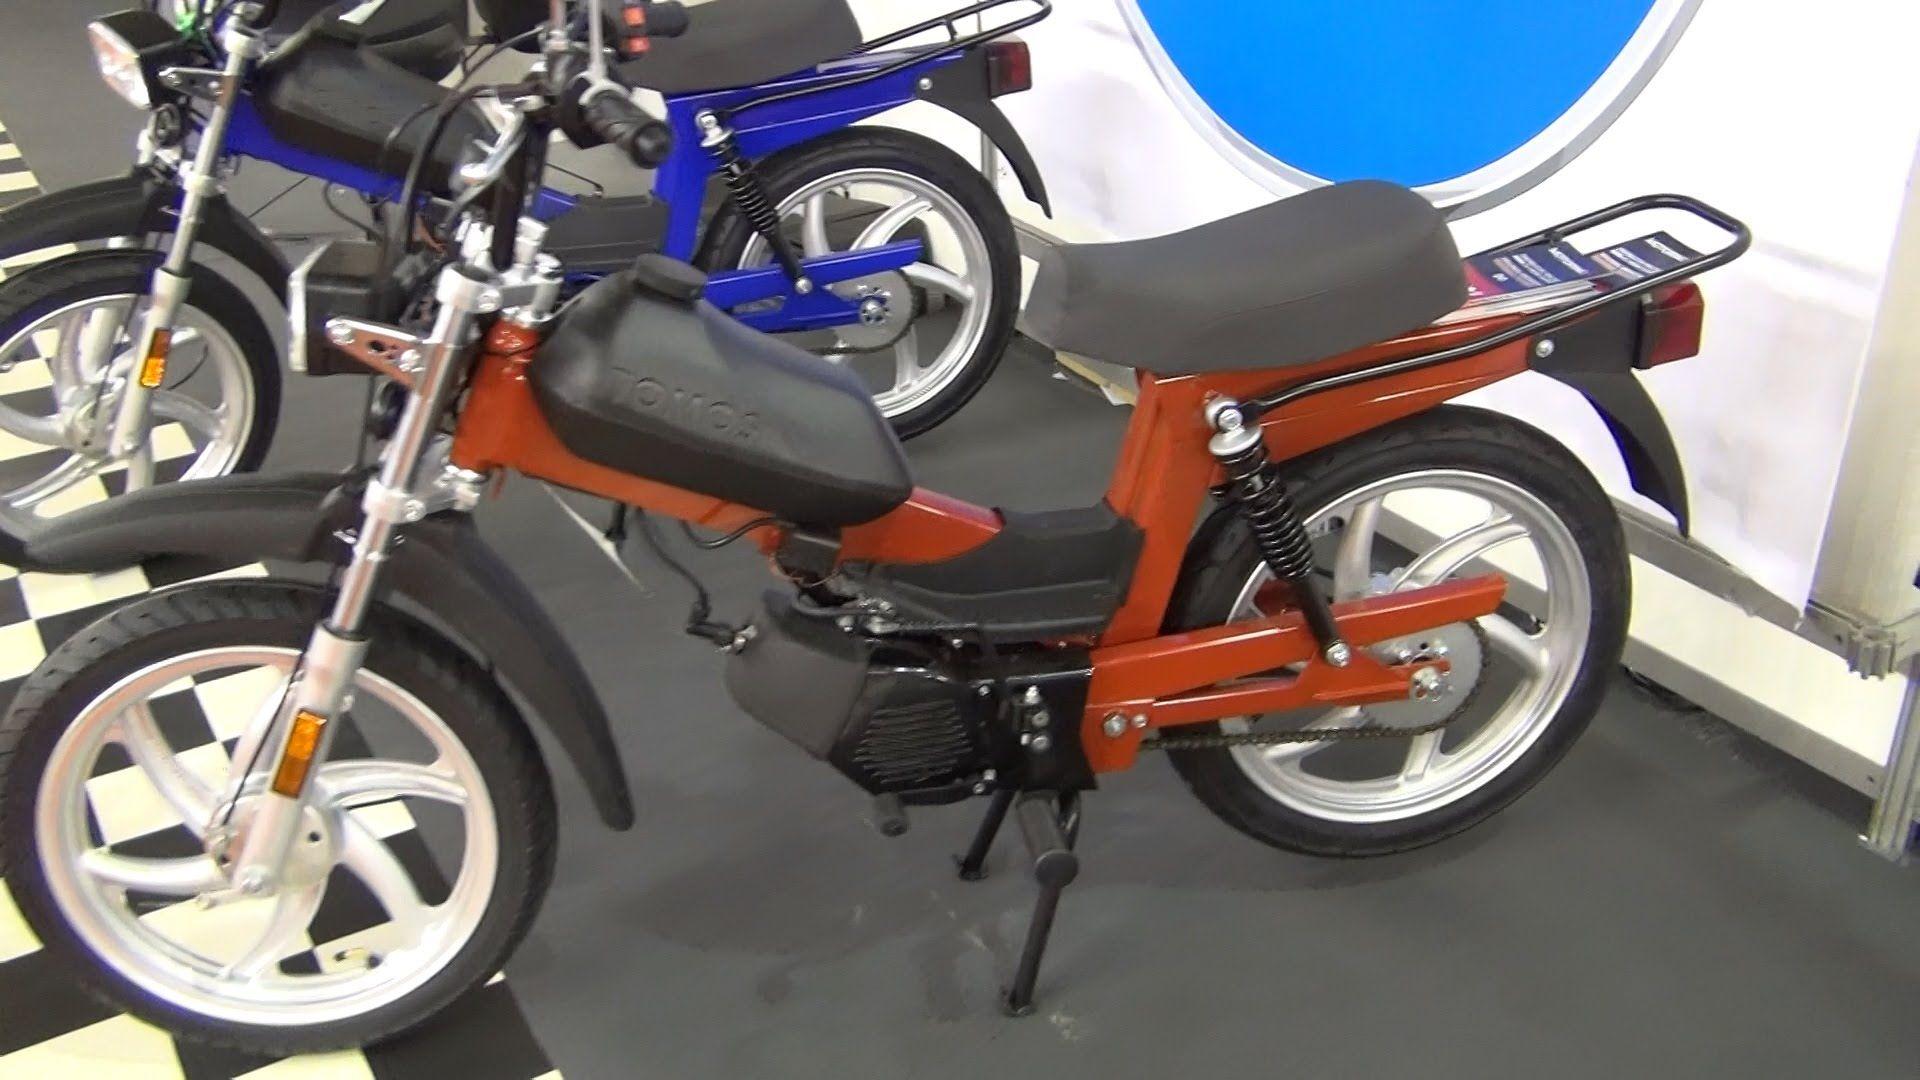 Tomos Apn 6s Moped Motorcycle Apn Car Show